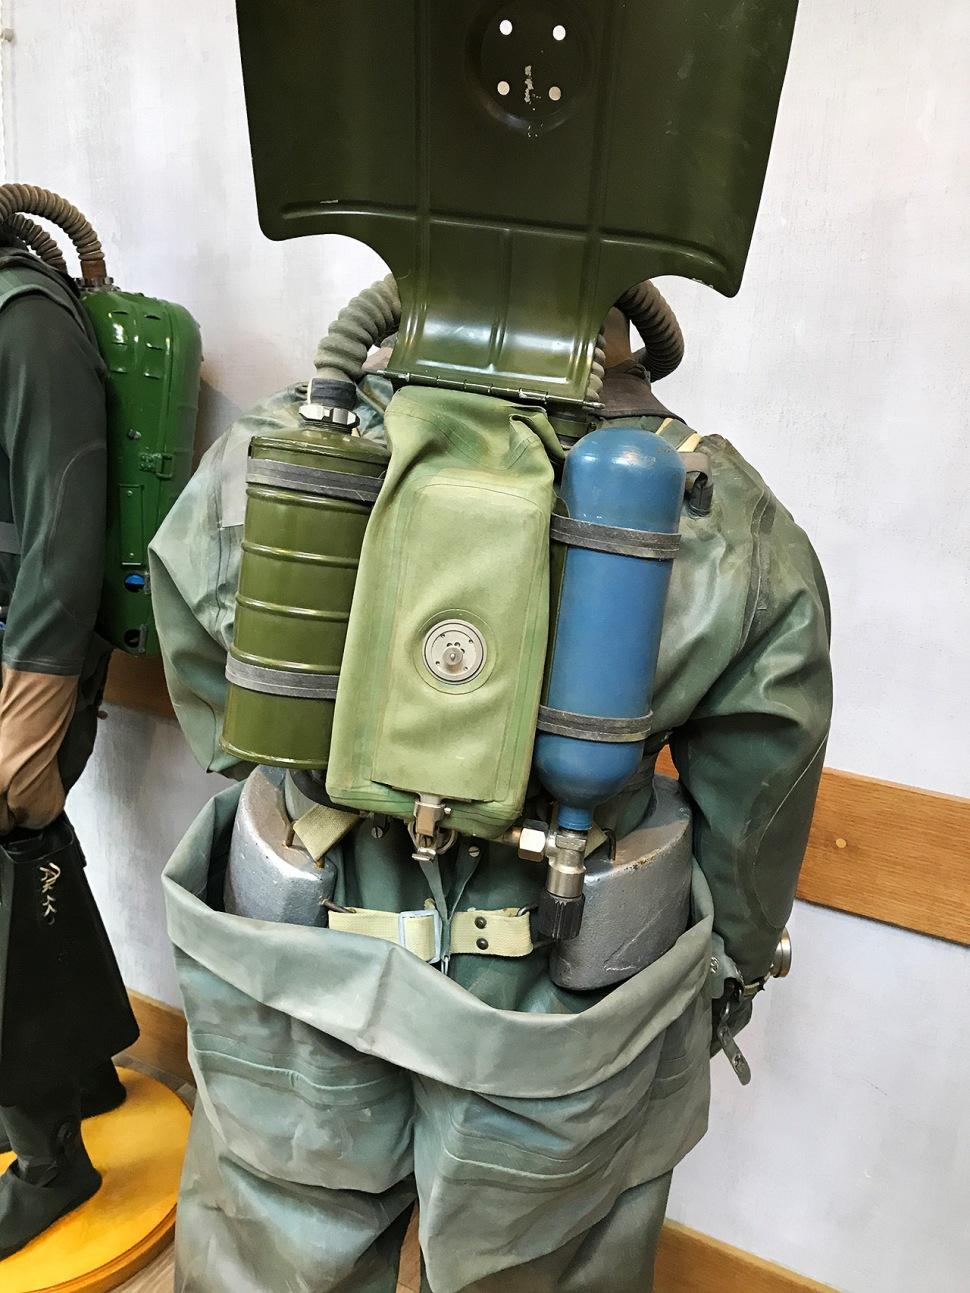 180627-panerai-gtg-moscow-paneristi-club-room-rebreather-IPSA-open